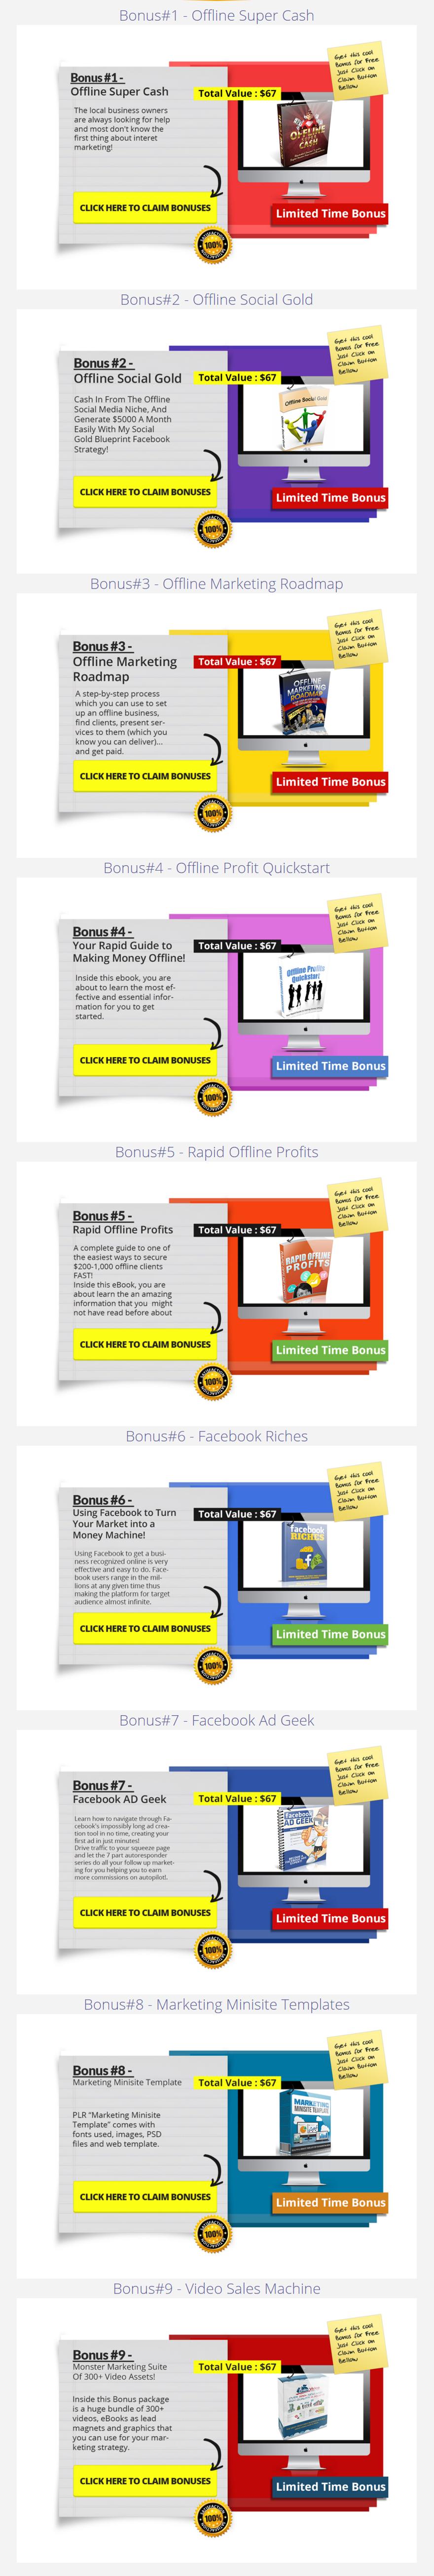 Easy Web Video Holiday Special Bonuses